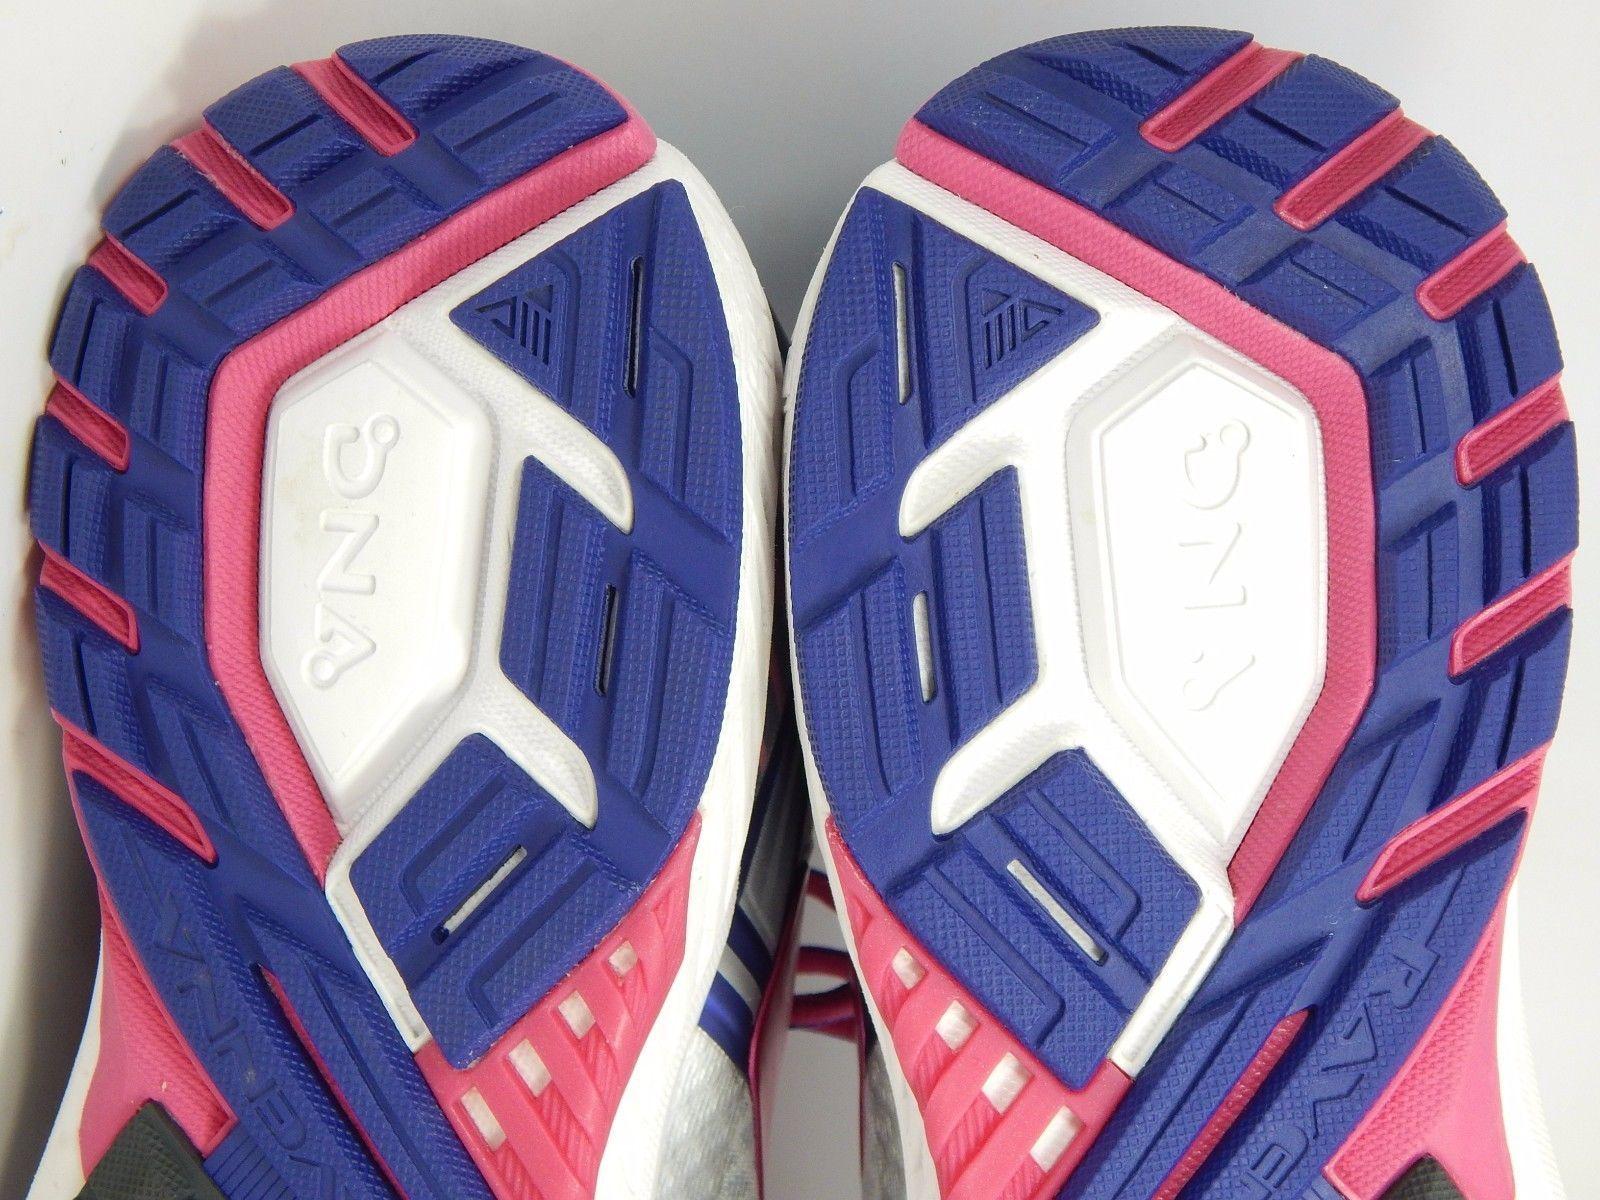 Brooks Ravenna 8 Women's Running Shoes Sz US 11.5 M (B) EU 44 Silver 1202381B089